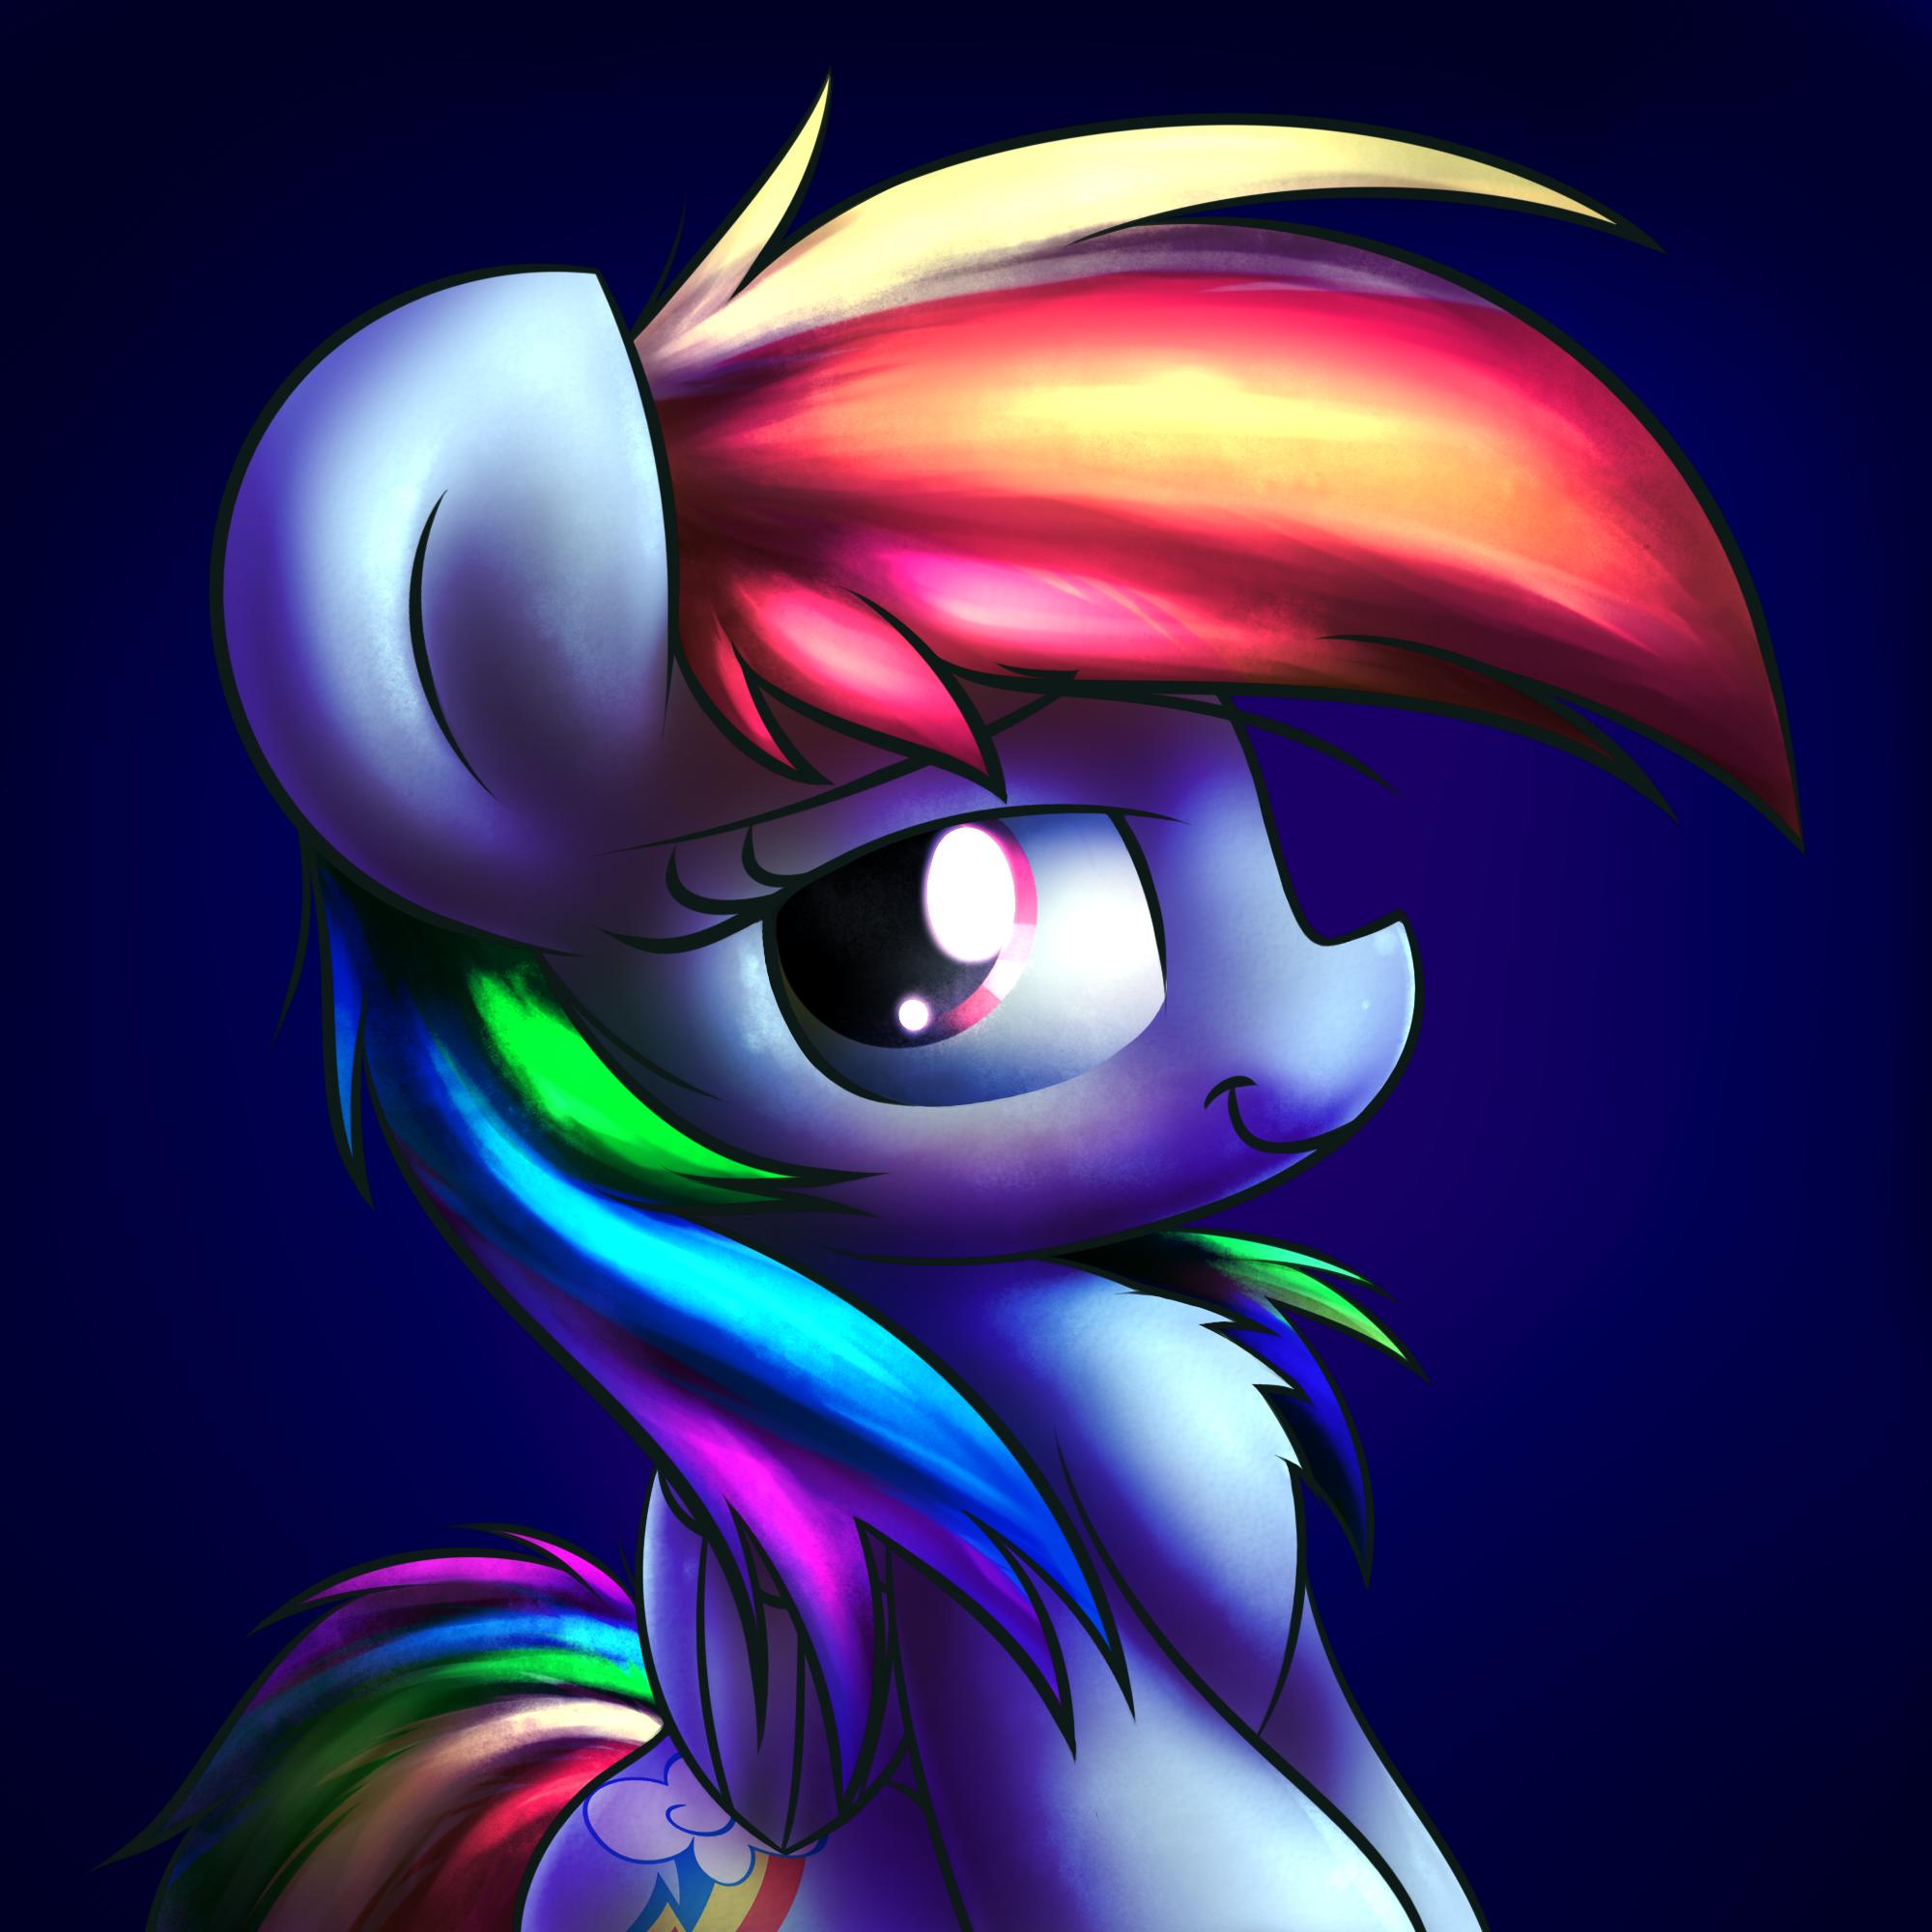 rainbow_horse_by_heavymetalbronyyeah-d8w